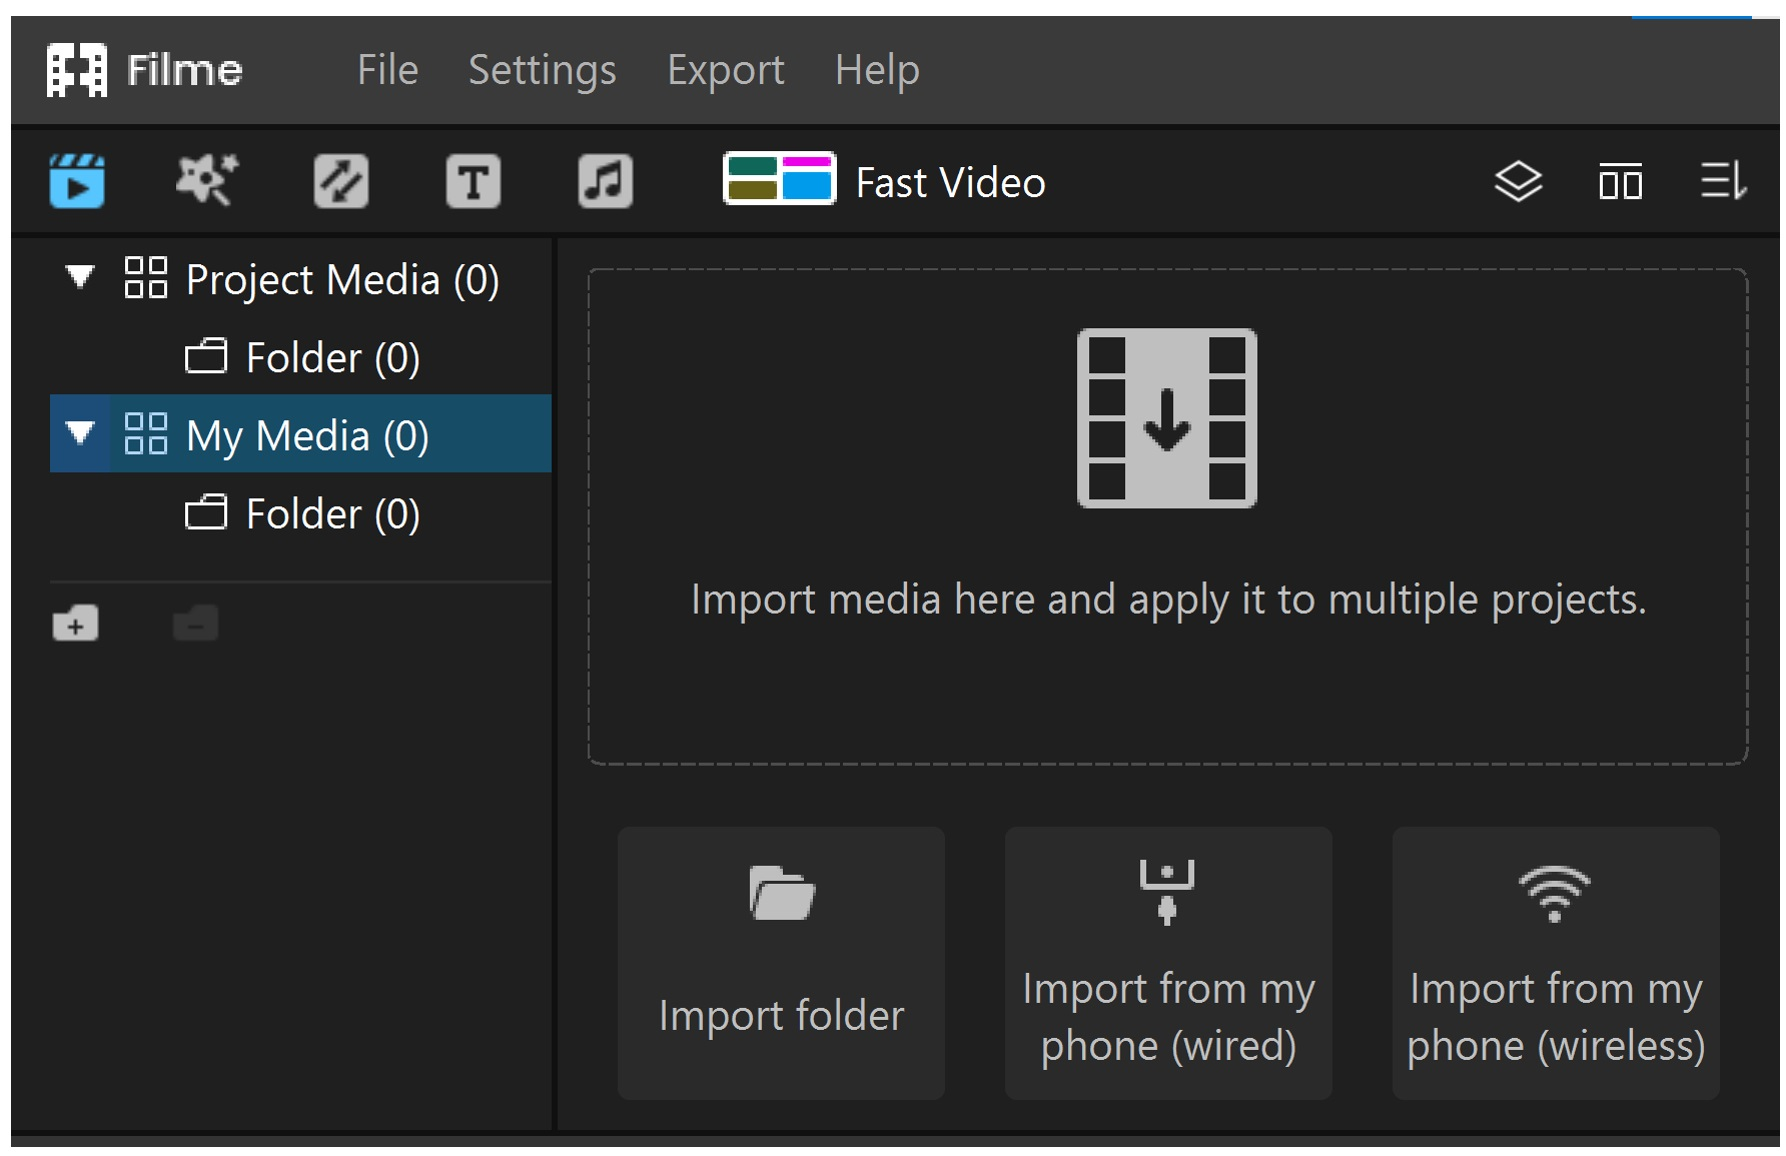 igtv video filme import files